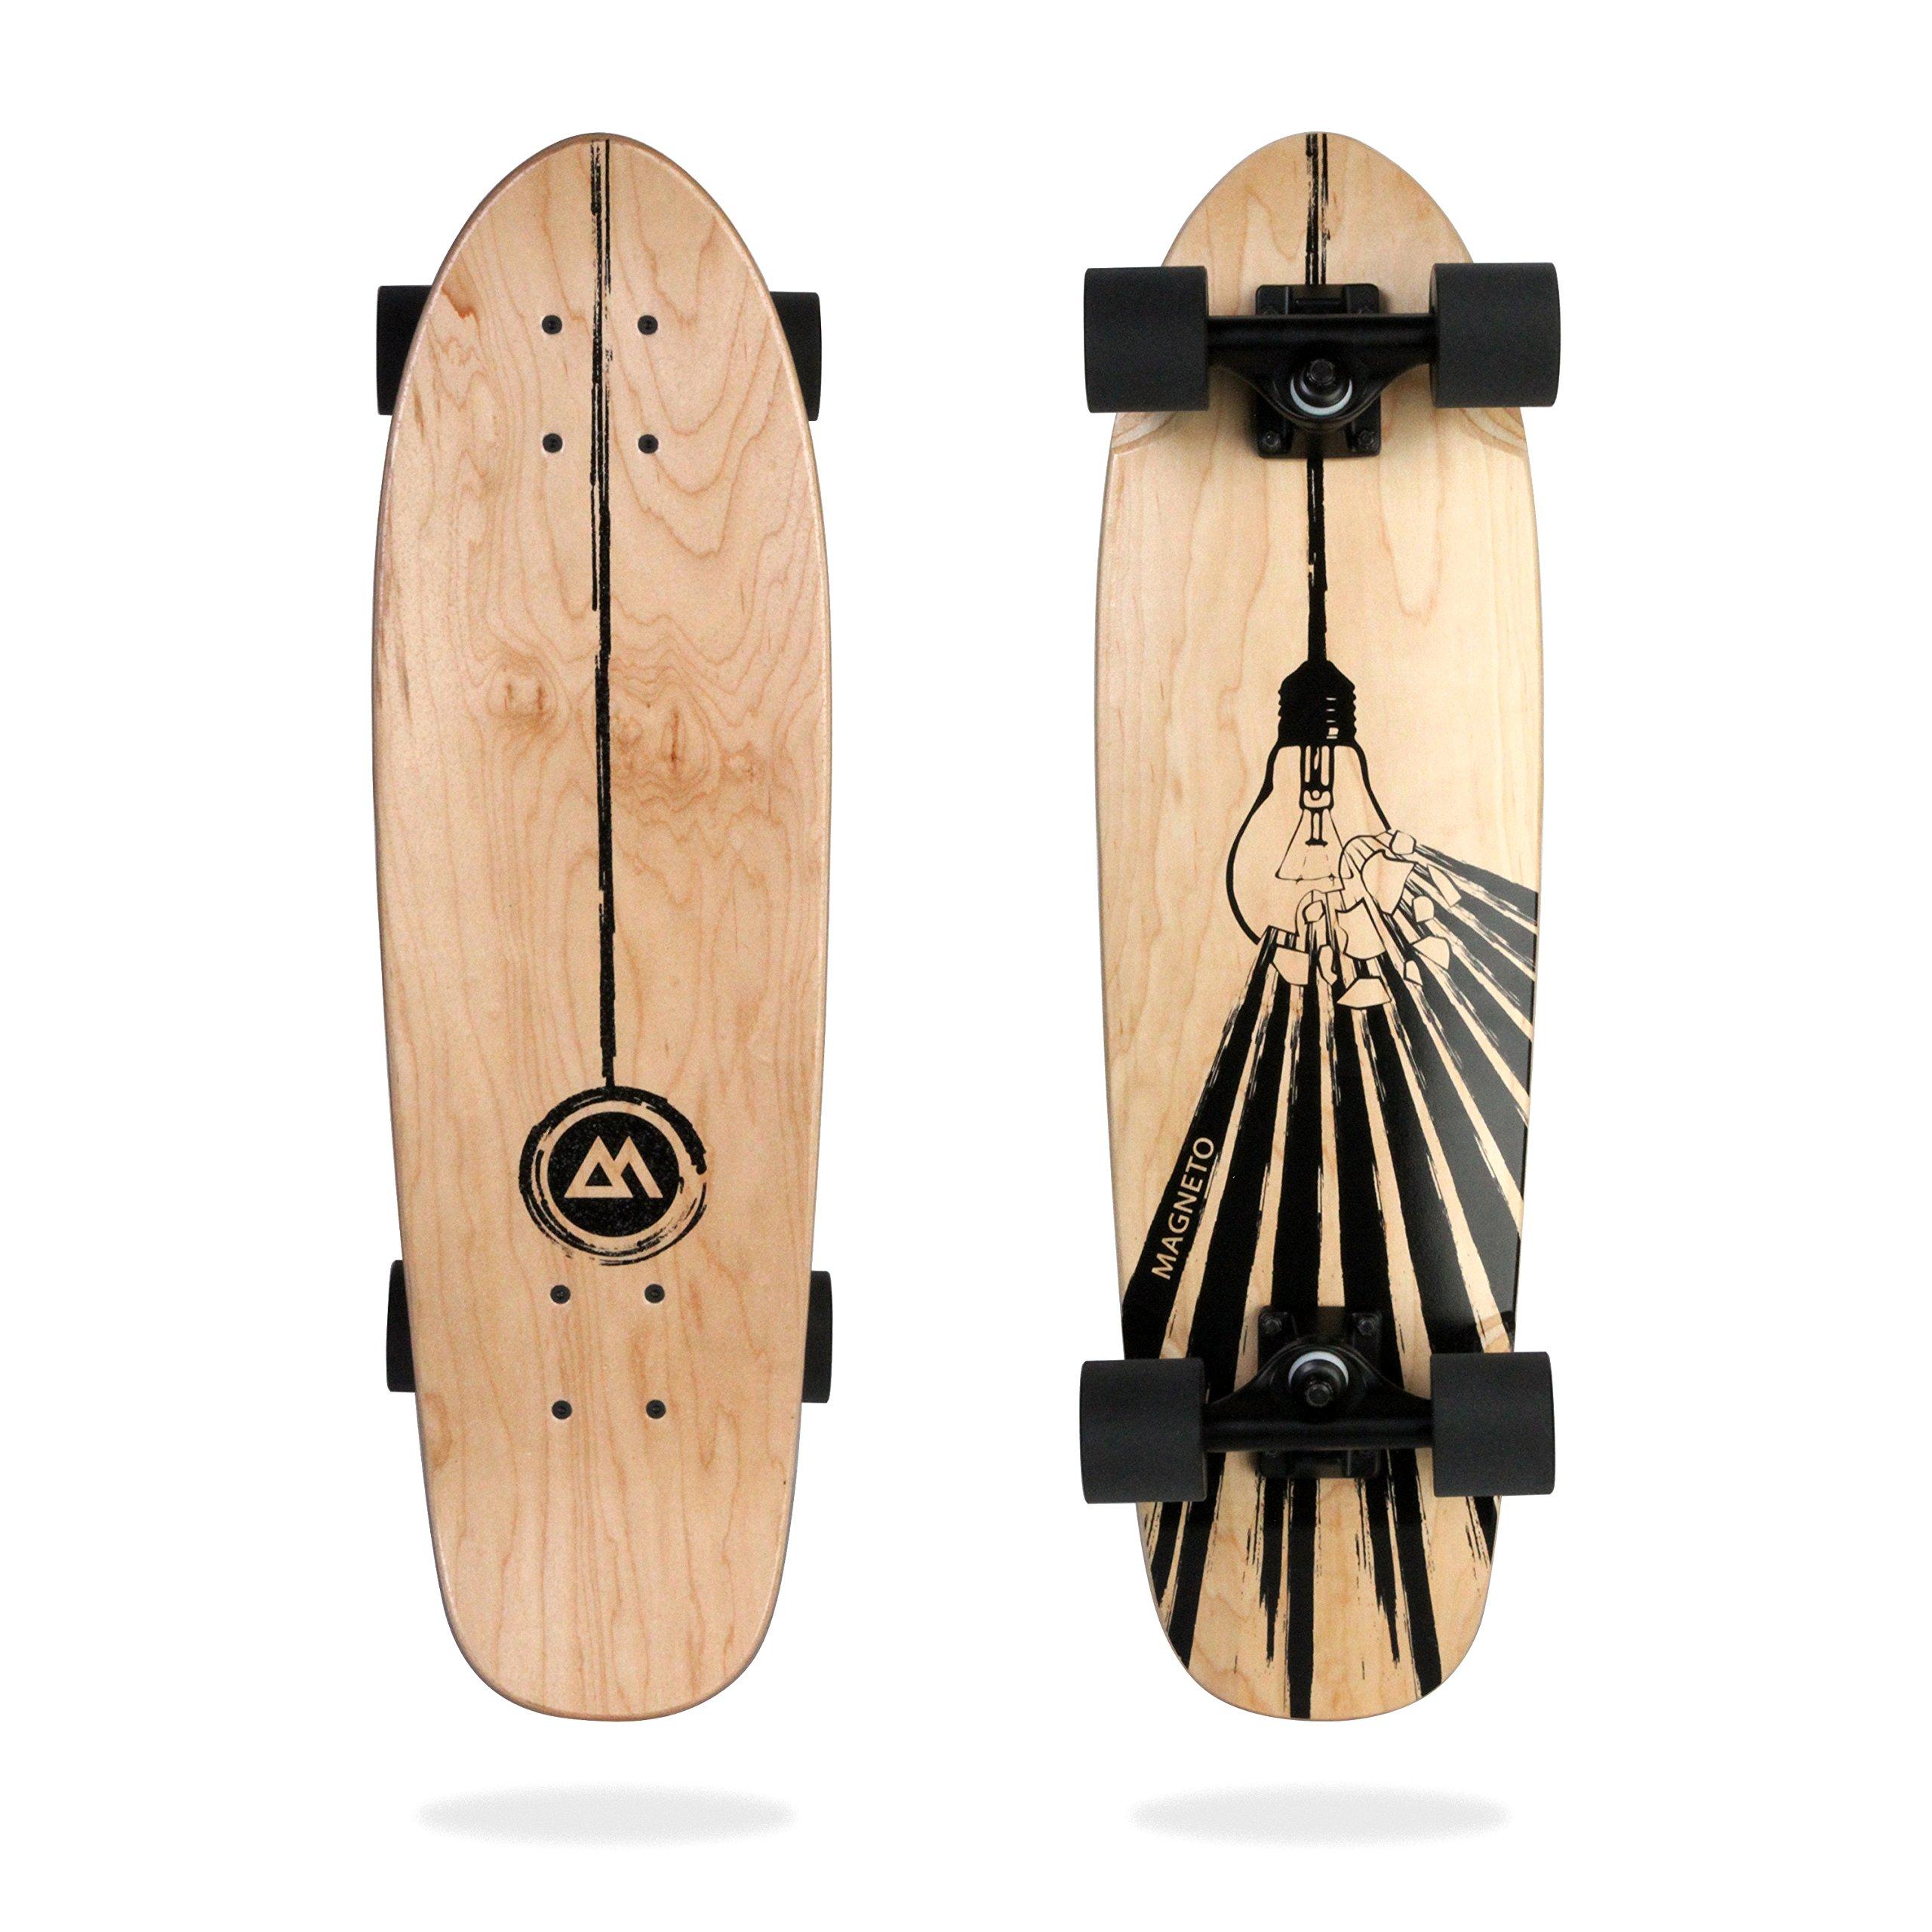 Magneto Mini Cruiser Skateboard Cruiser   Short Board   Canadian Maple Deck - Designed for Kids, Teens and Adults … (Light-Bulb)